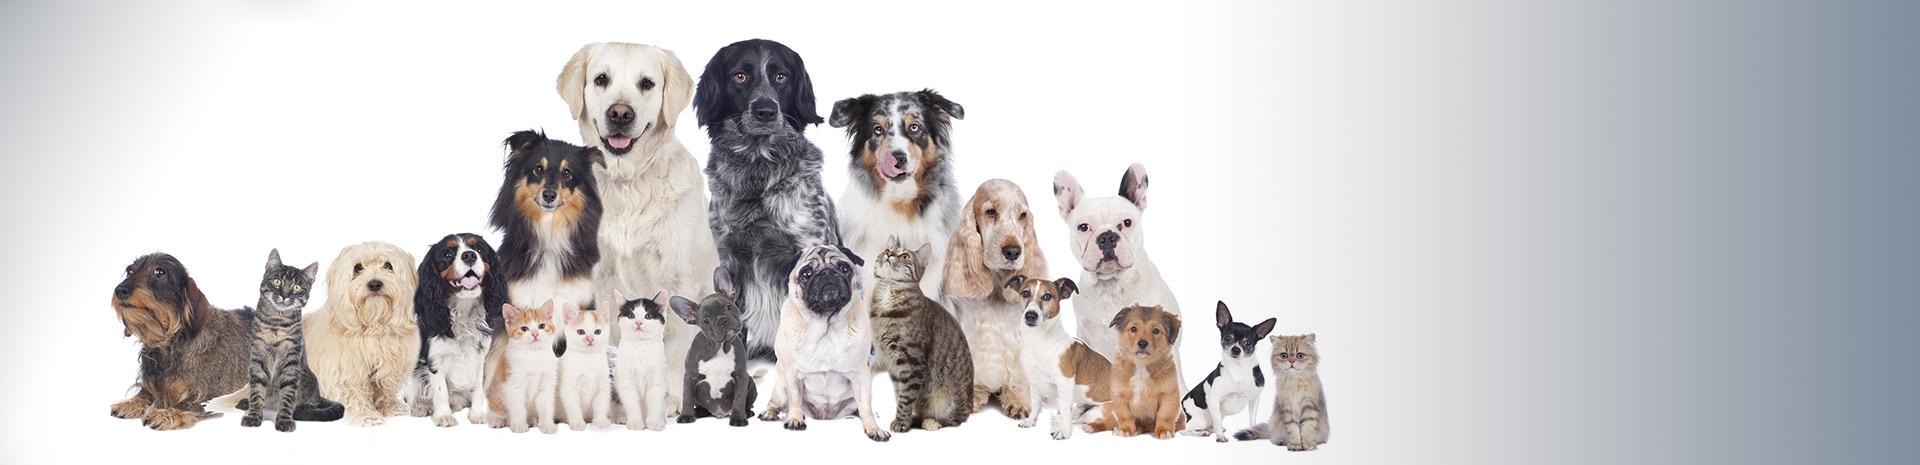 Las mascotas